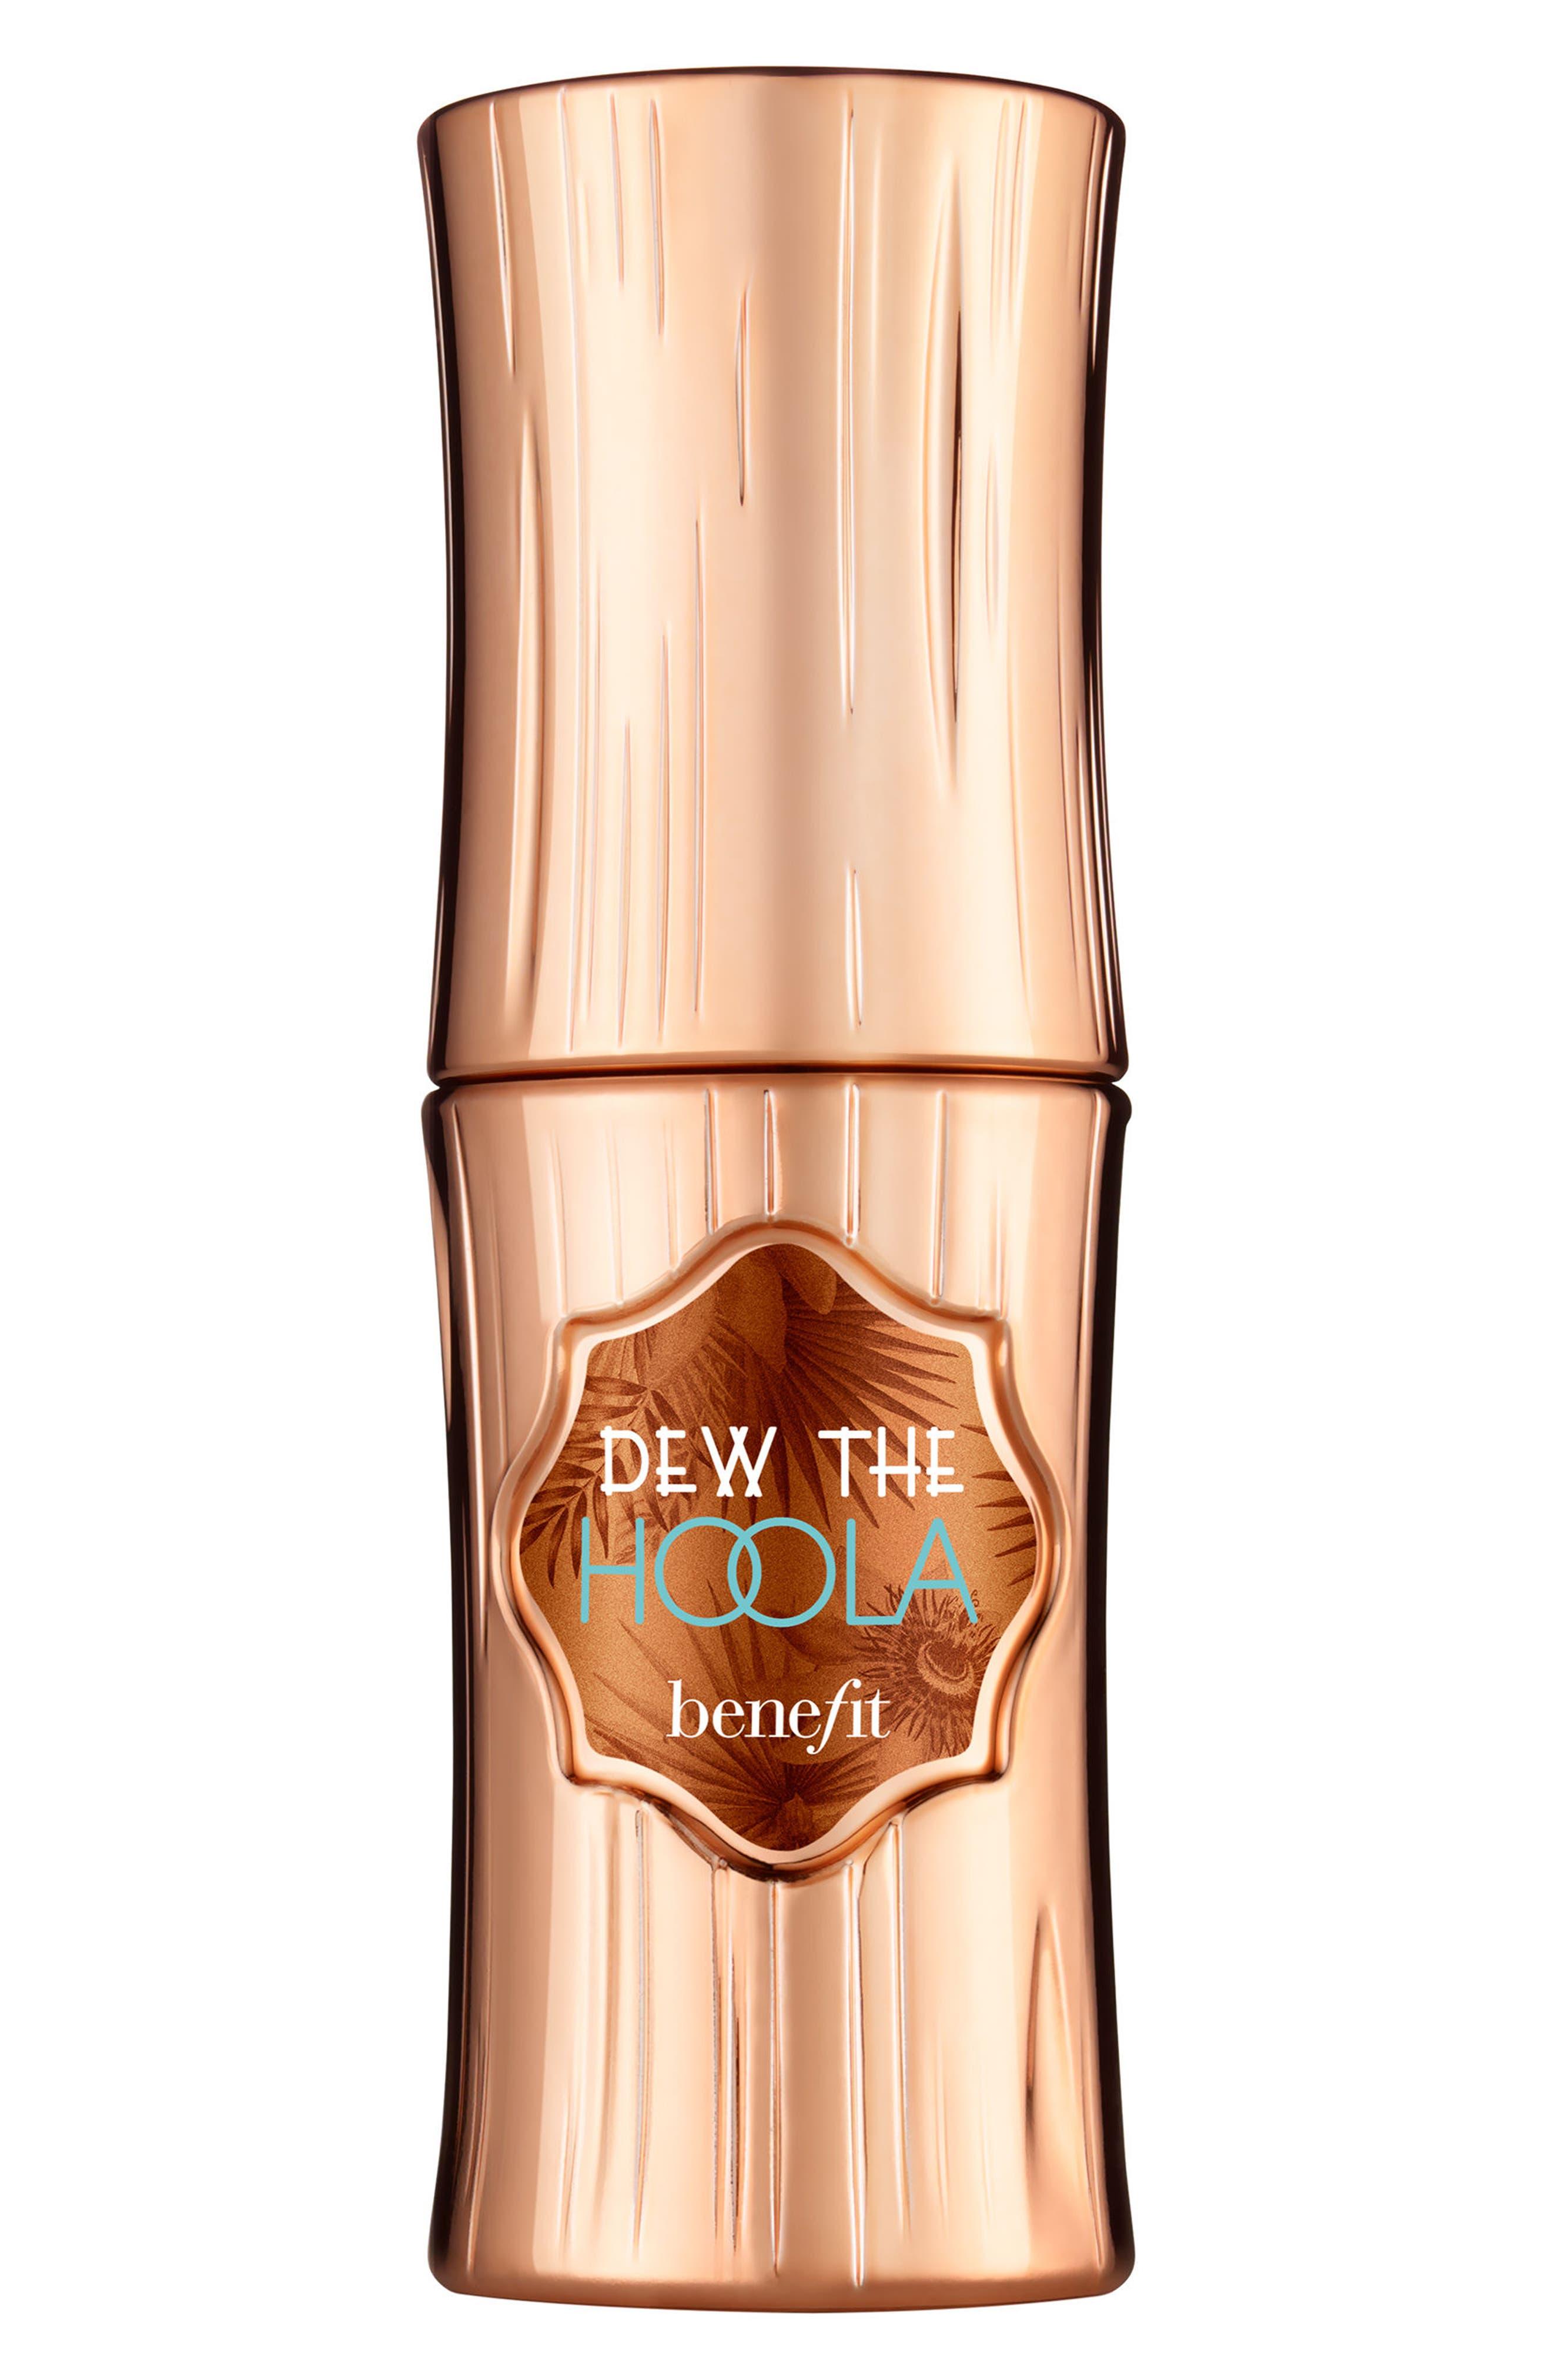 Benefit Dew the Hoola Matte Liquid Bronzer,                             Main thumbnail 1, color,                             BRONZE